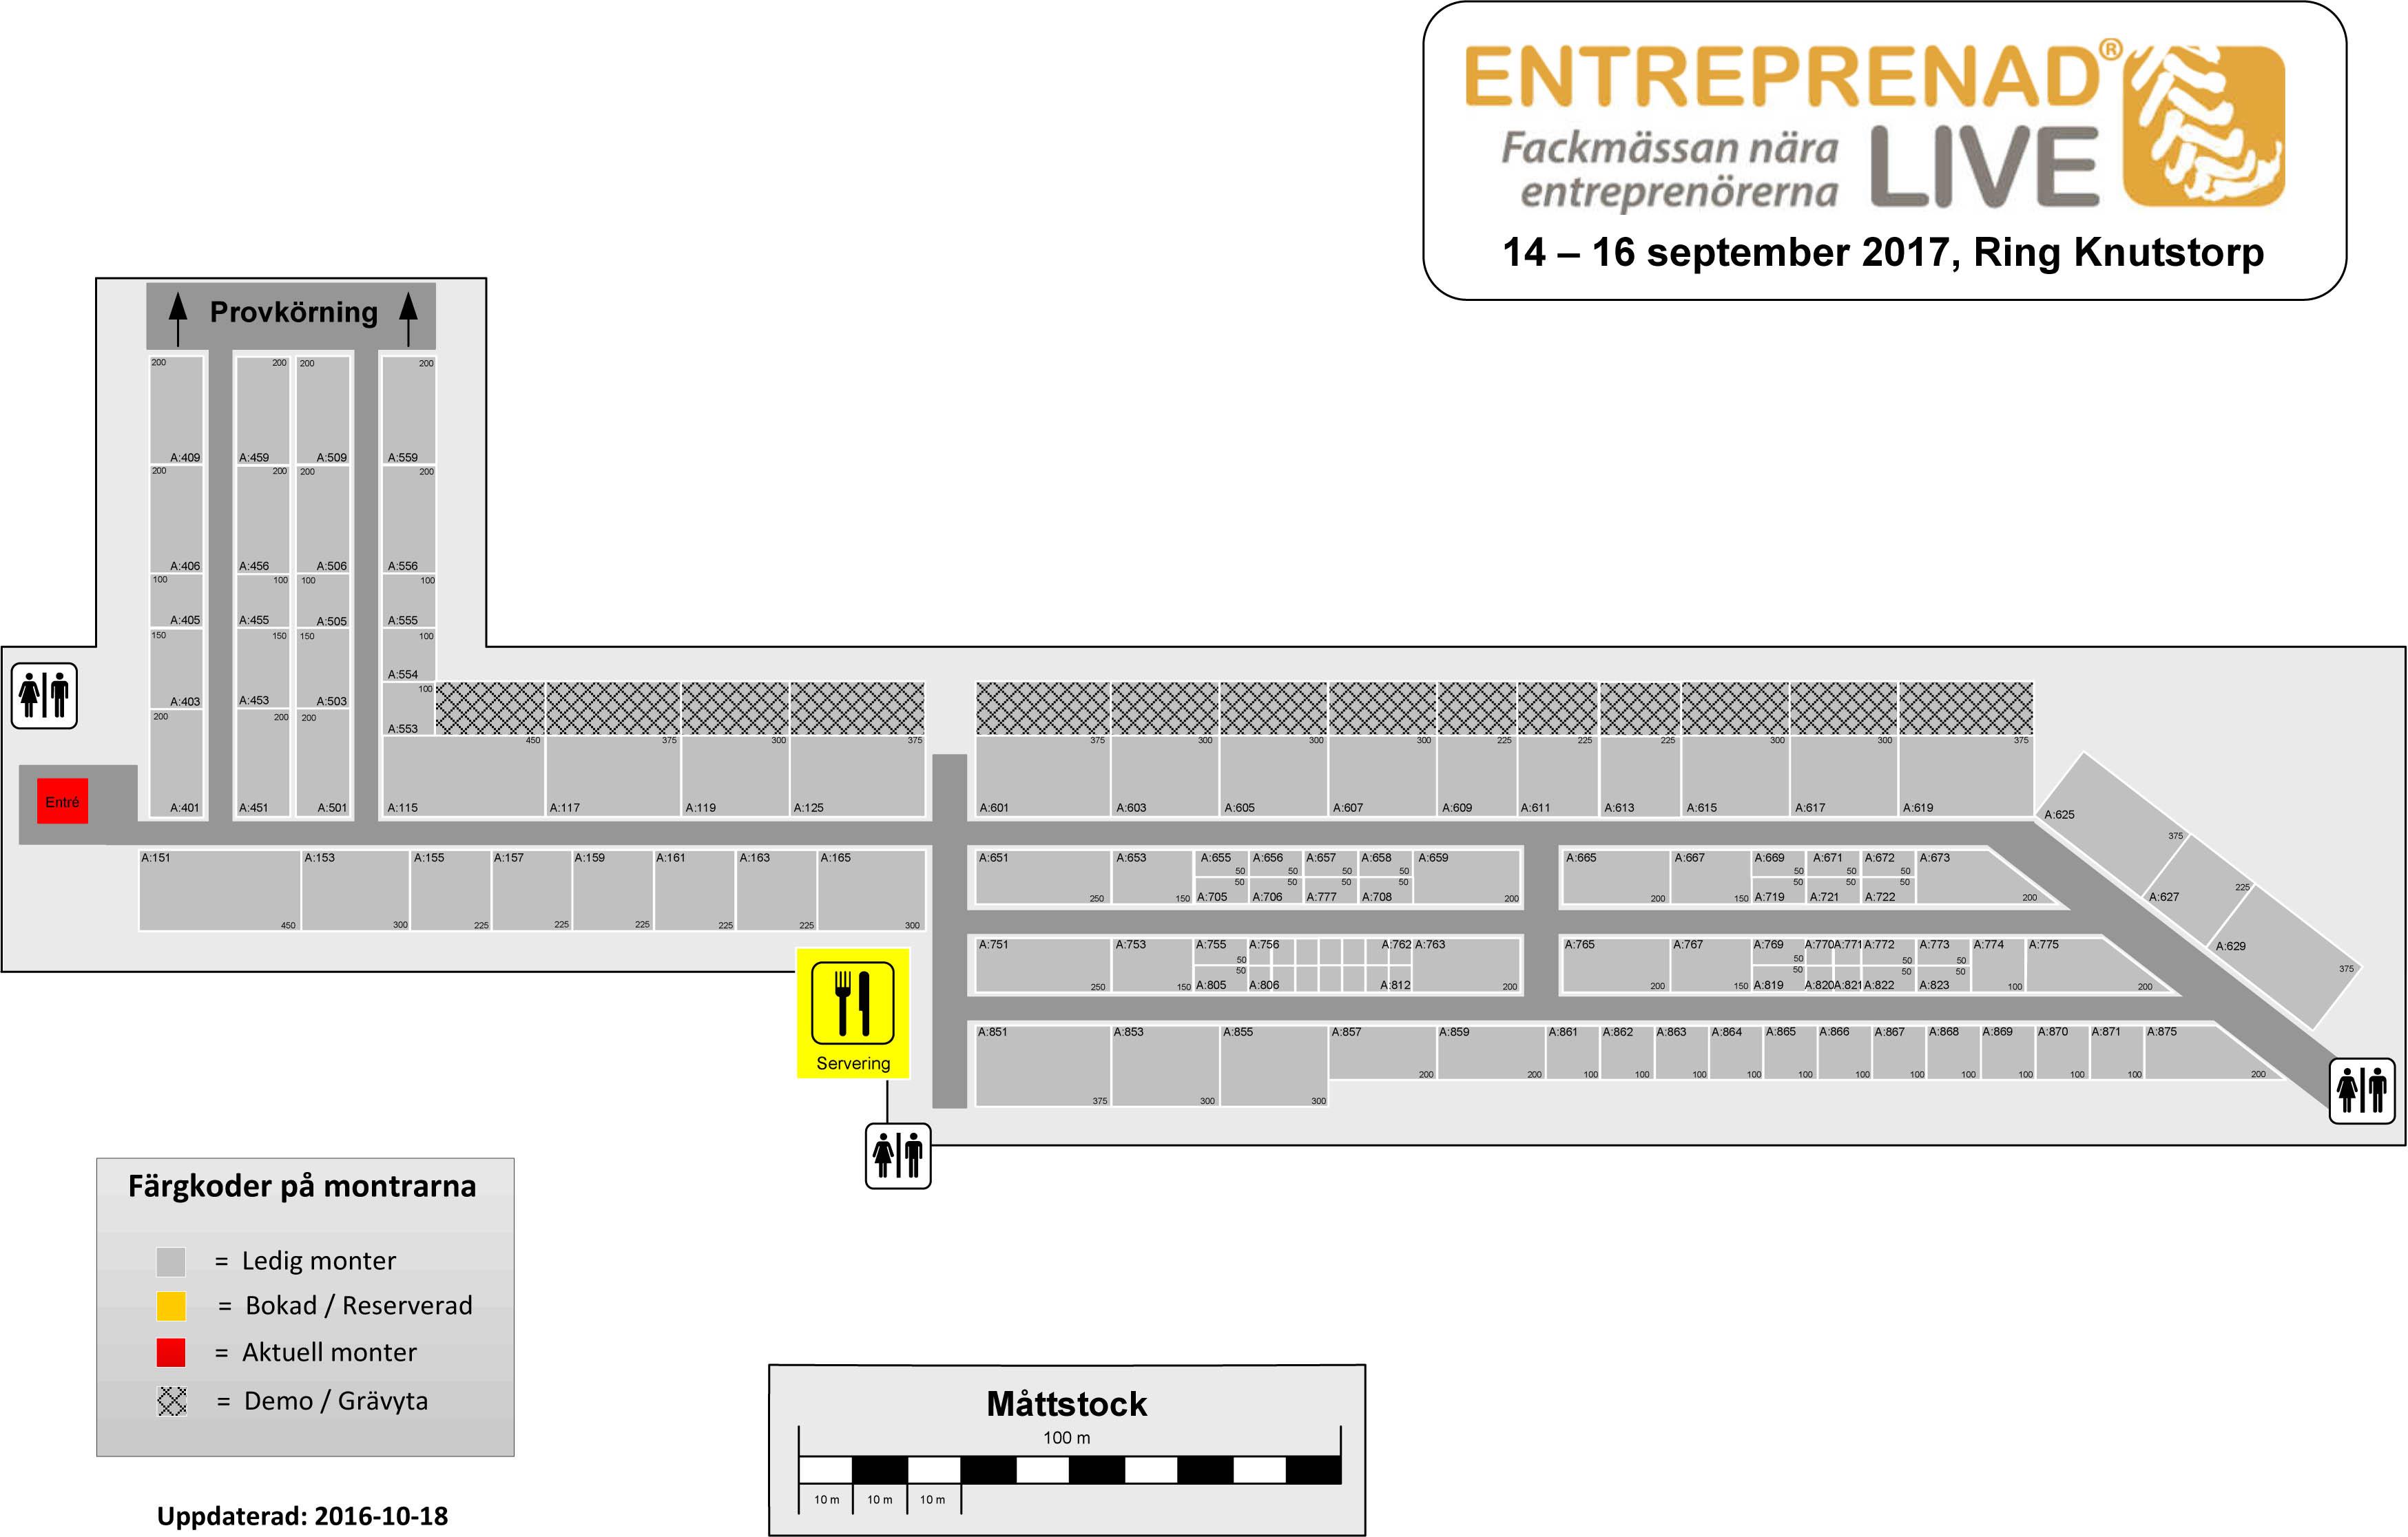 Visio-Monterskiss, Entreprenad Live 2017 Skåne